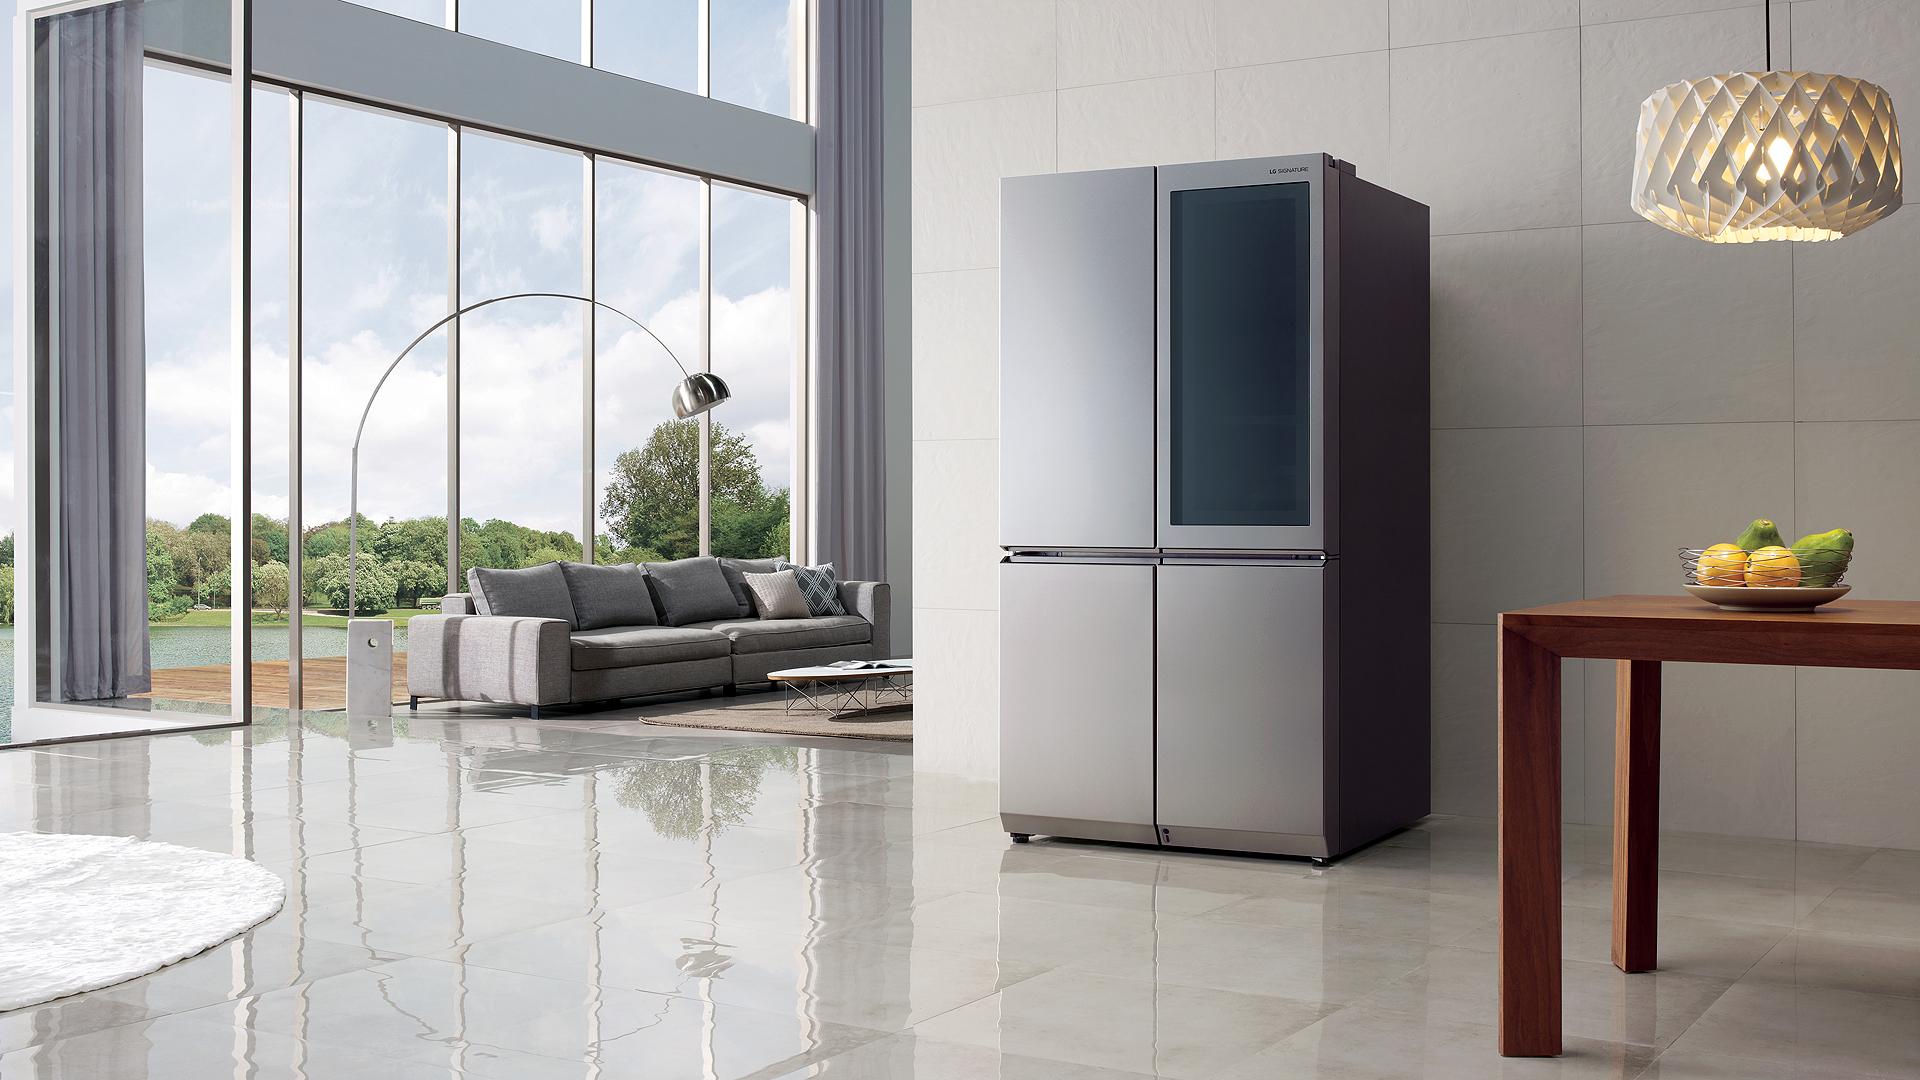 Best fridge freezer 2019: ice cool tech | T3